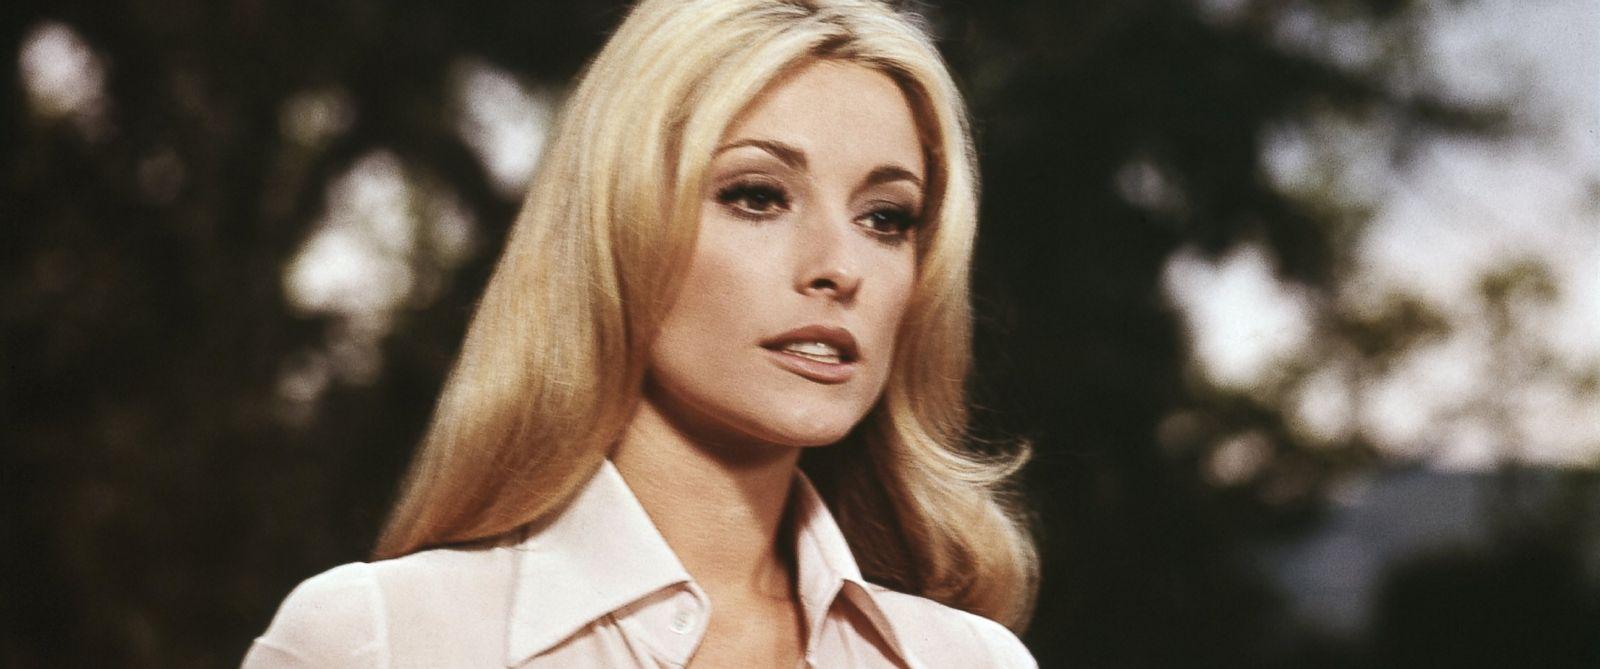 PHOTO: Sharon Tate in 1967.